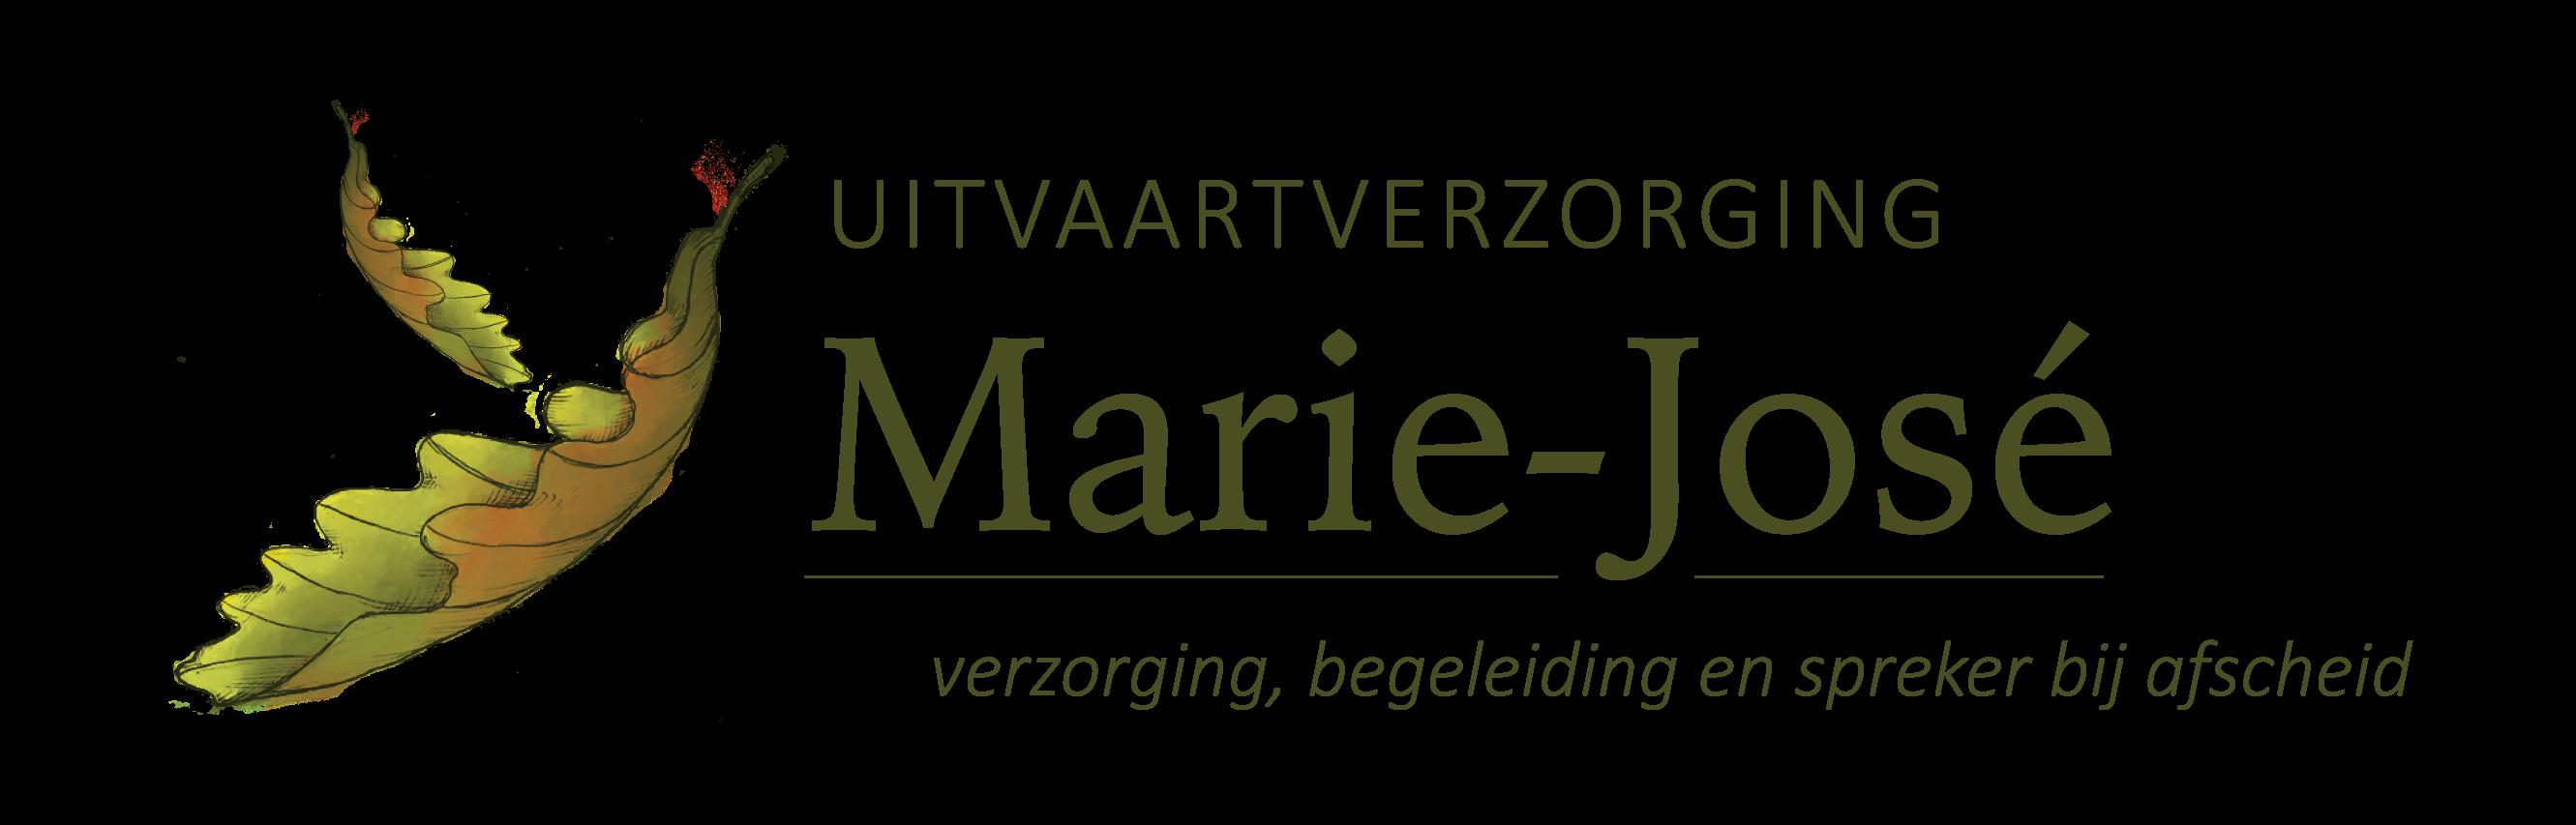 Uitvaartverzorging Marie-José